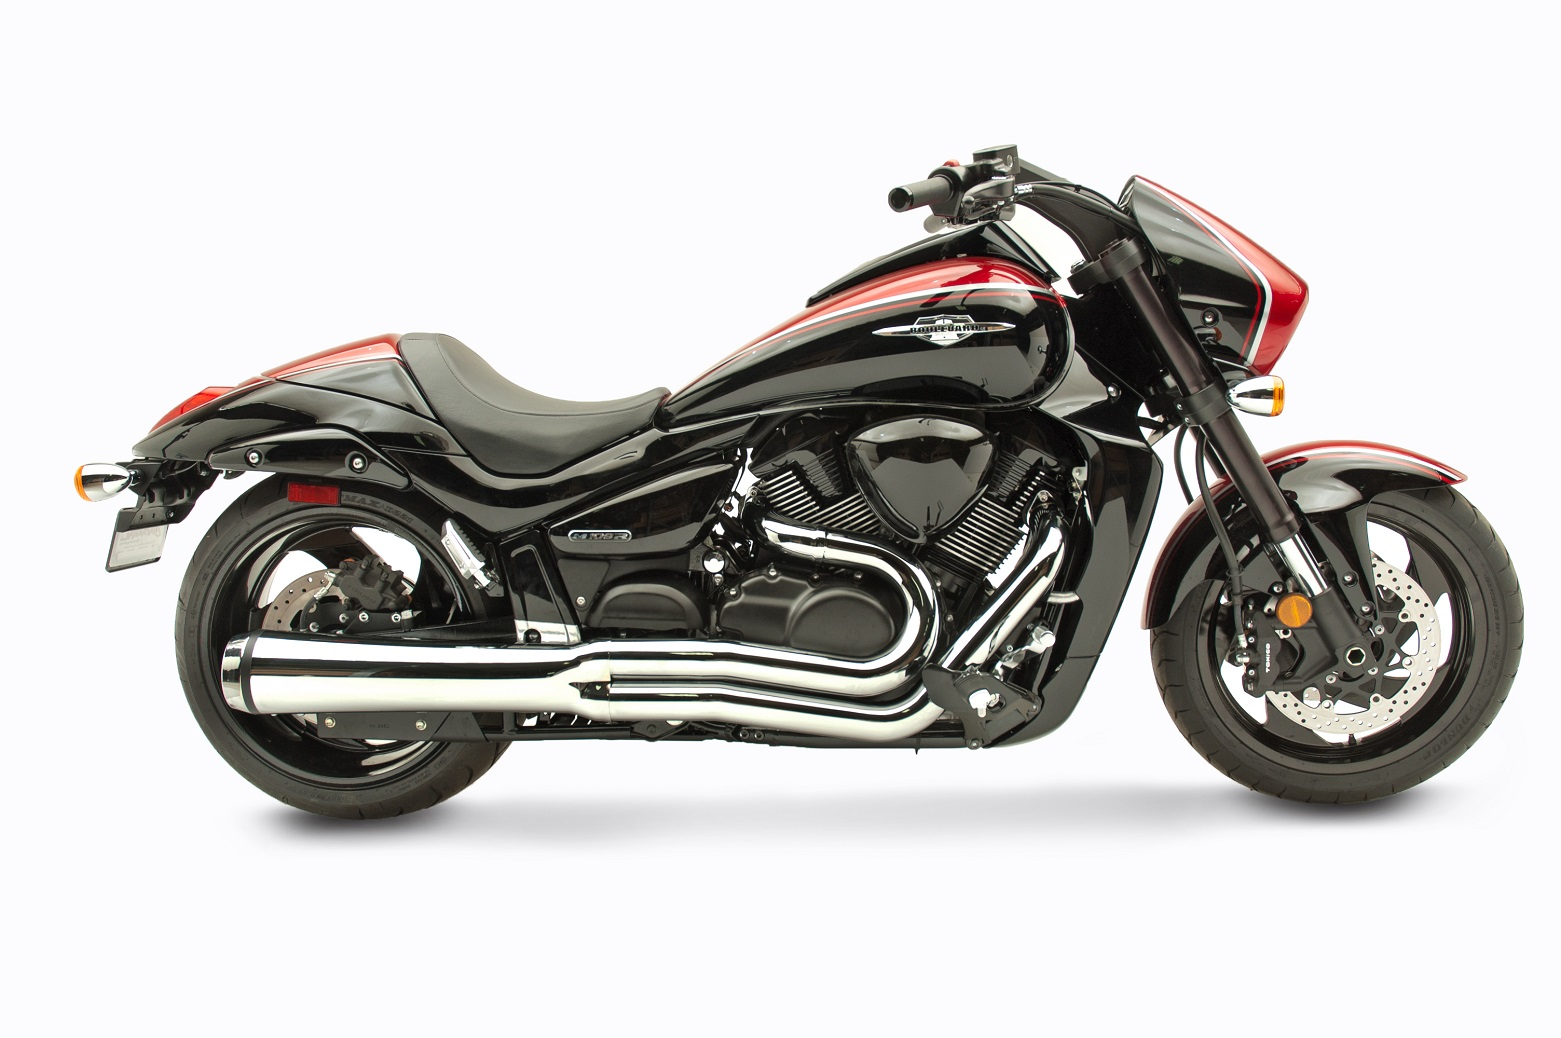 Suzuki M109R Motorcycle Exhaust - Velocity Pro Chrome | Hard-Krome